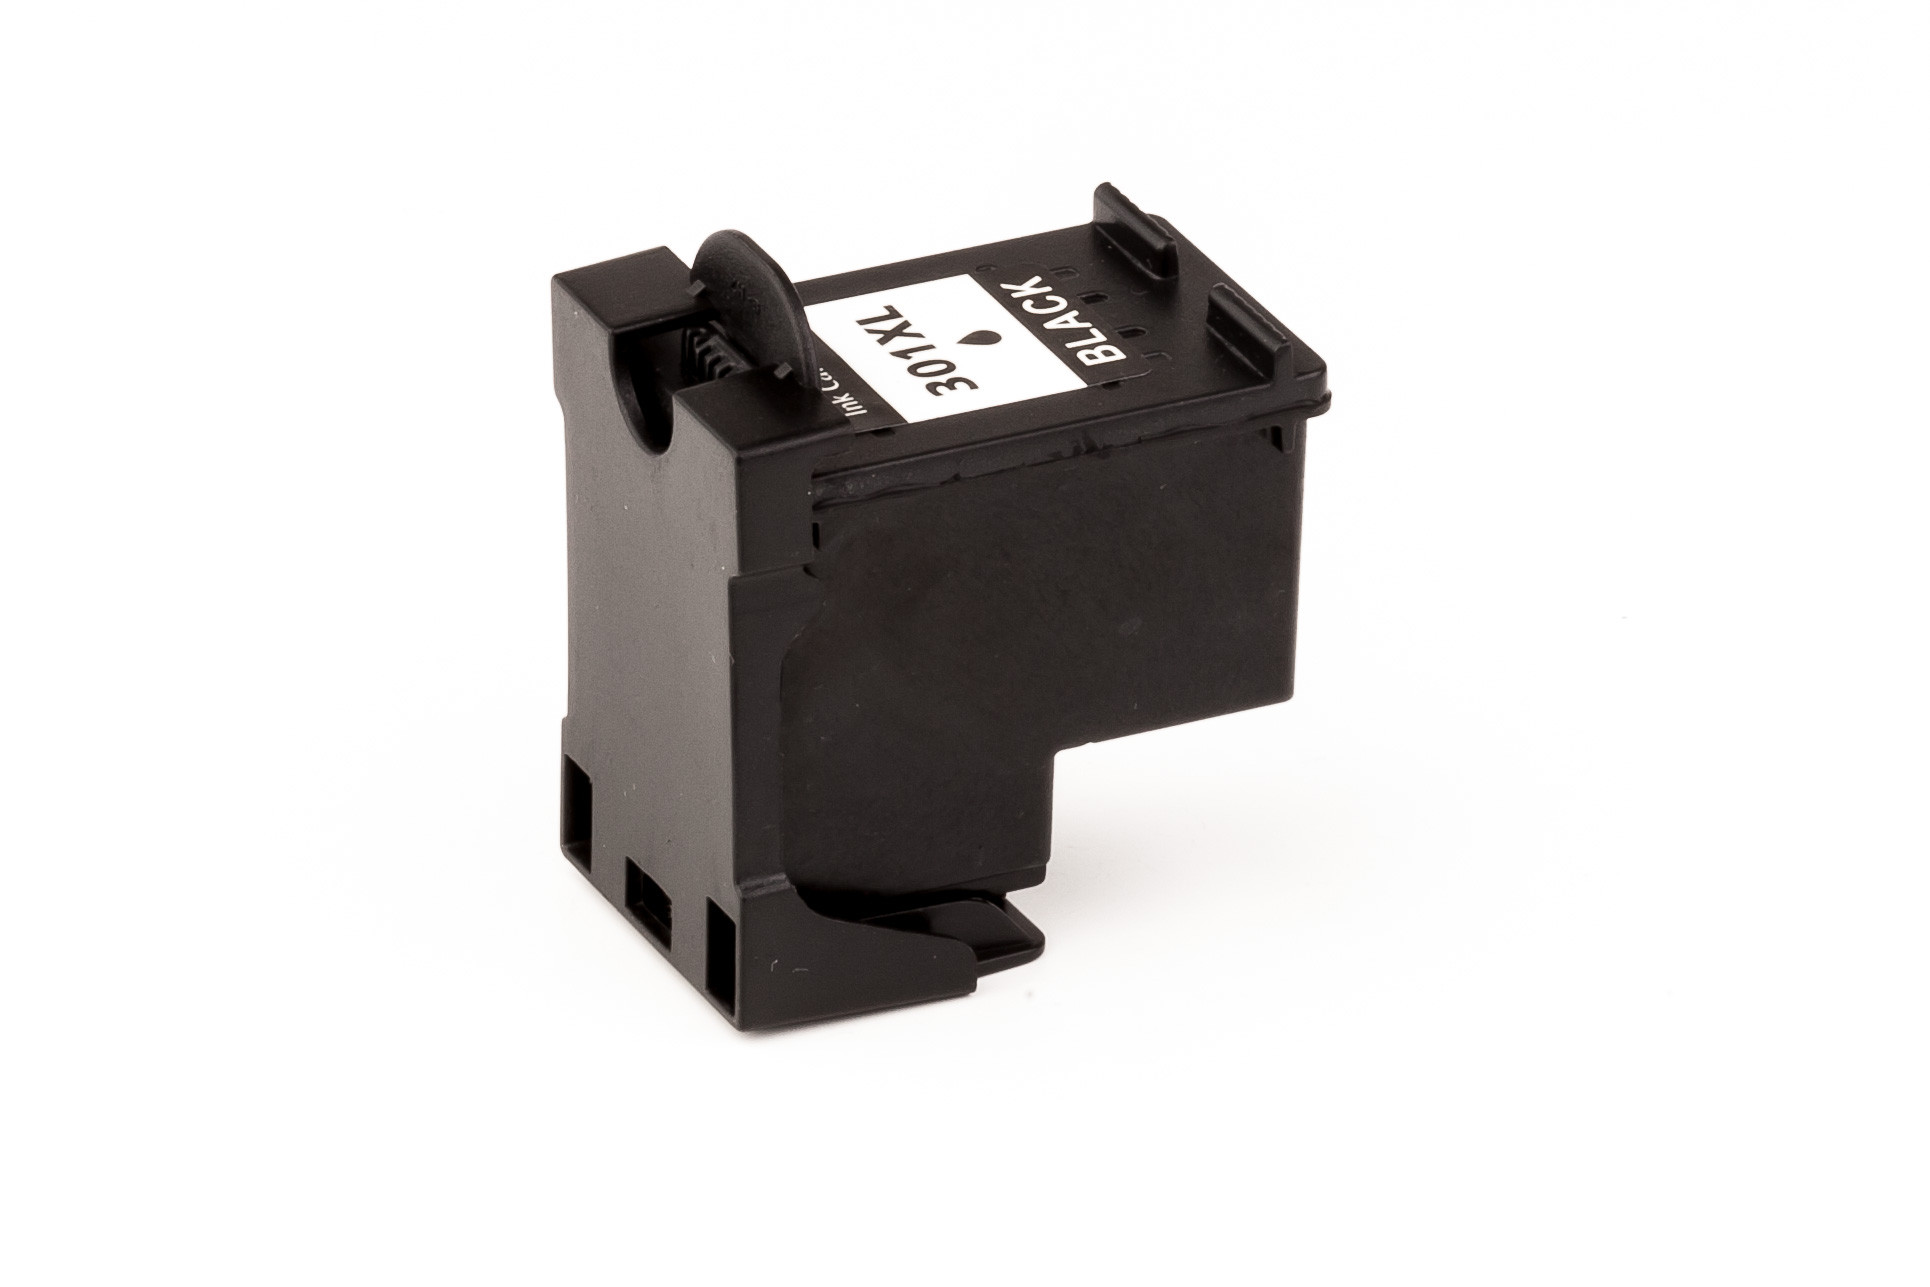 ECO-Tinte / Druckkopf (rebuilt) für HP Nr. 301XL / CH563EE schwarz